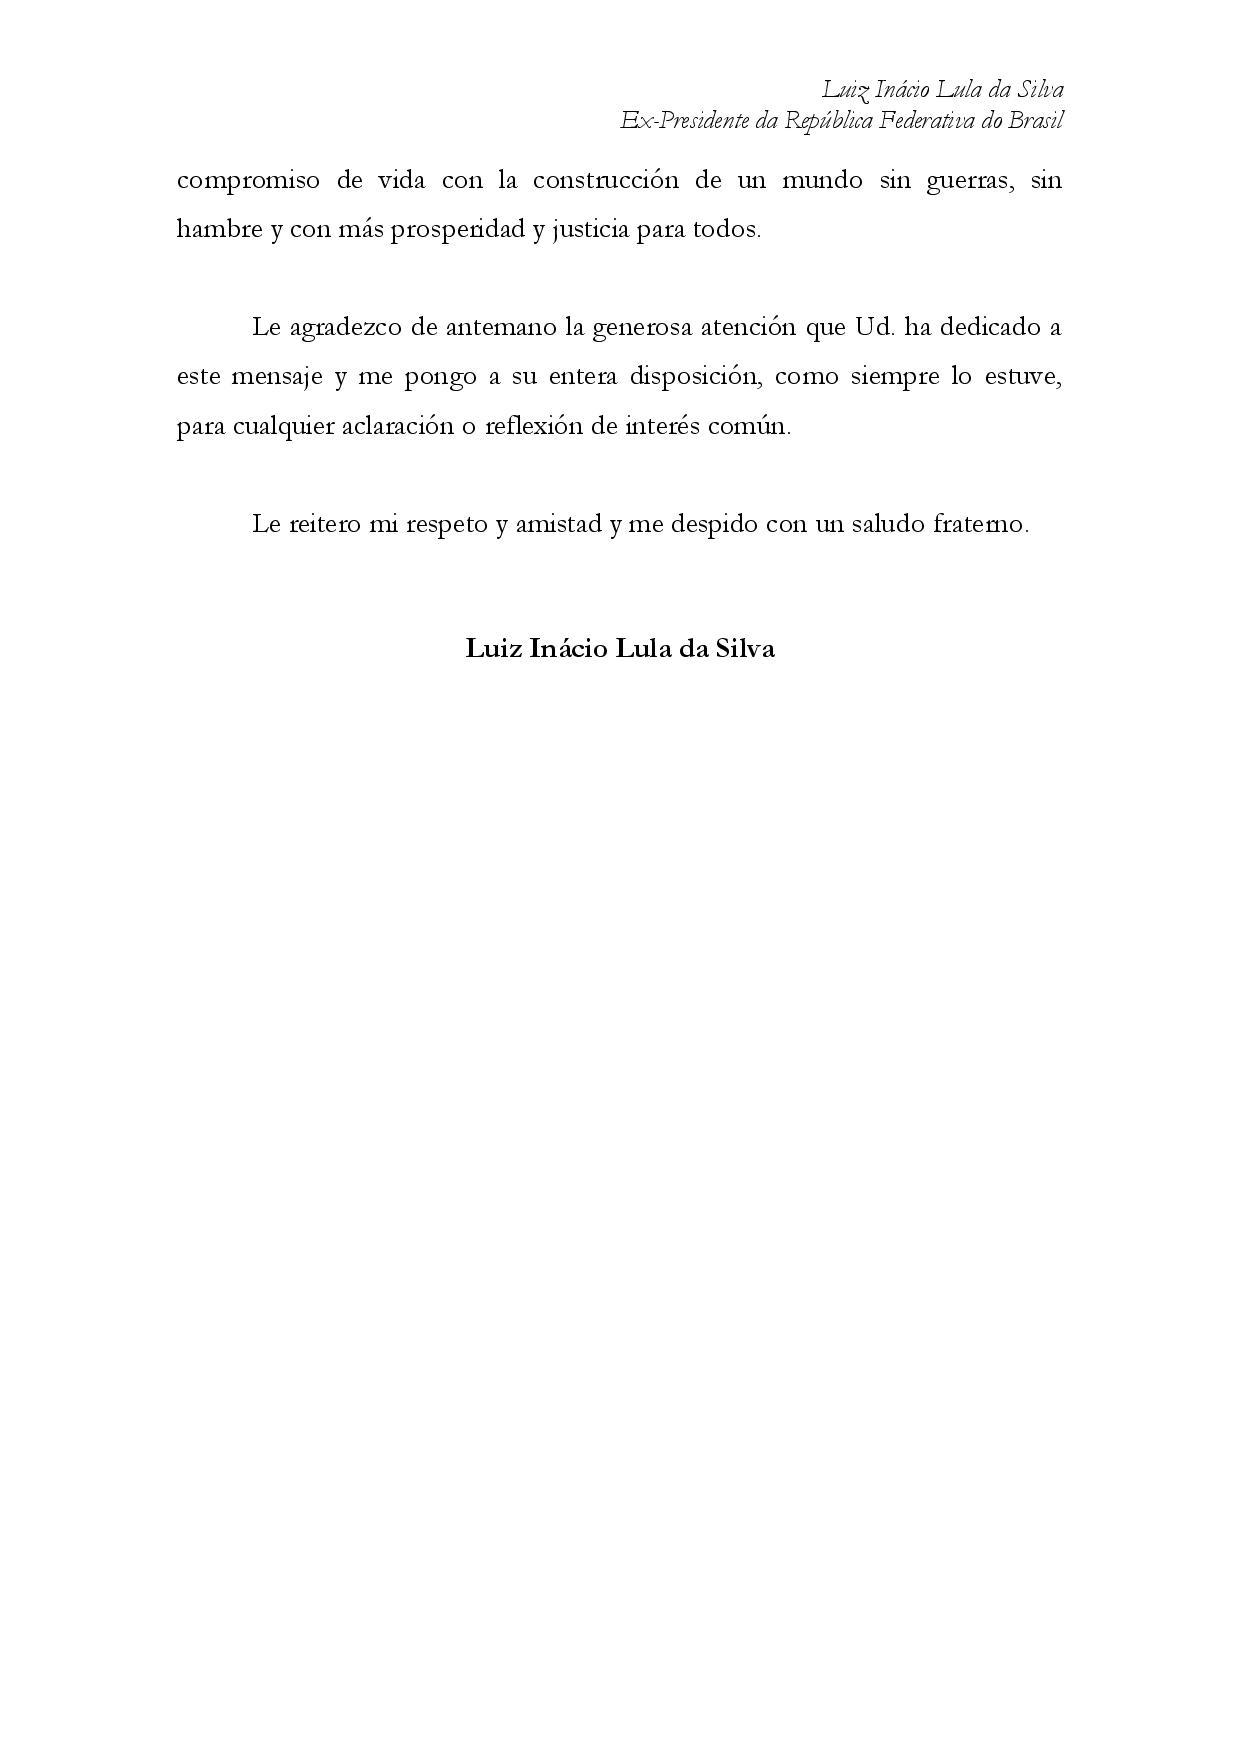 Argentina Ex-presidenta-page-007